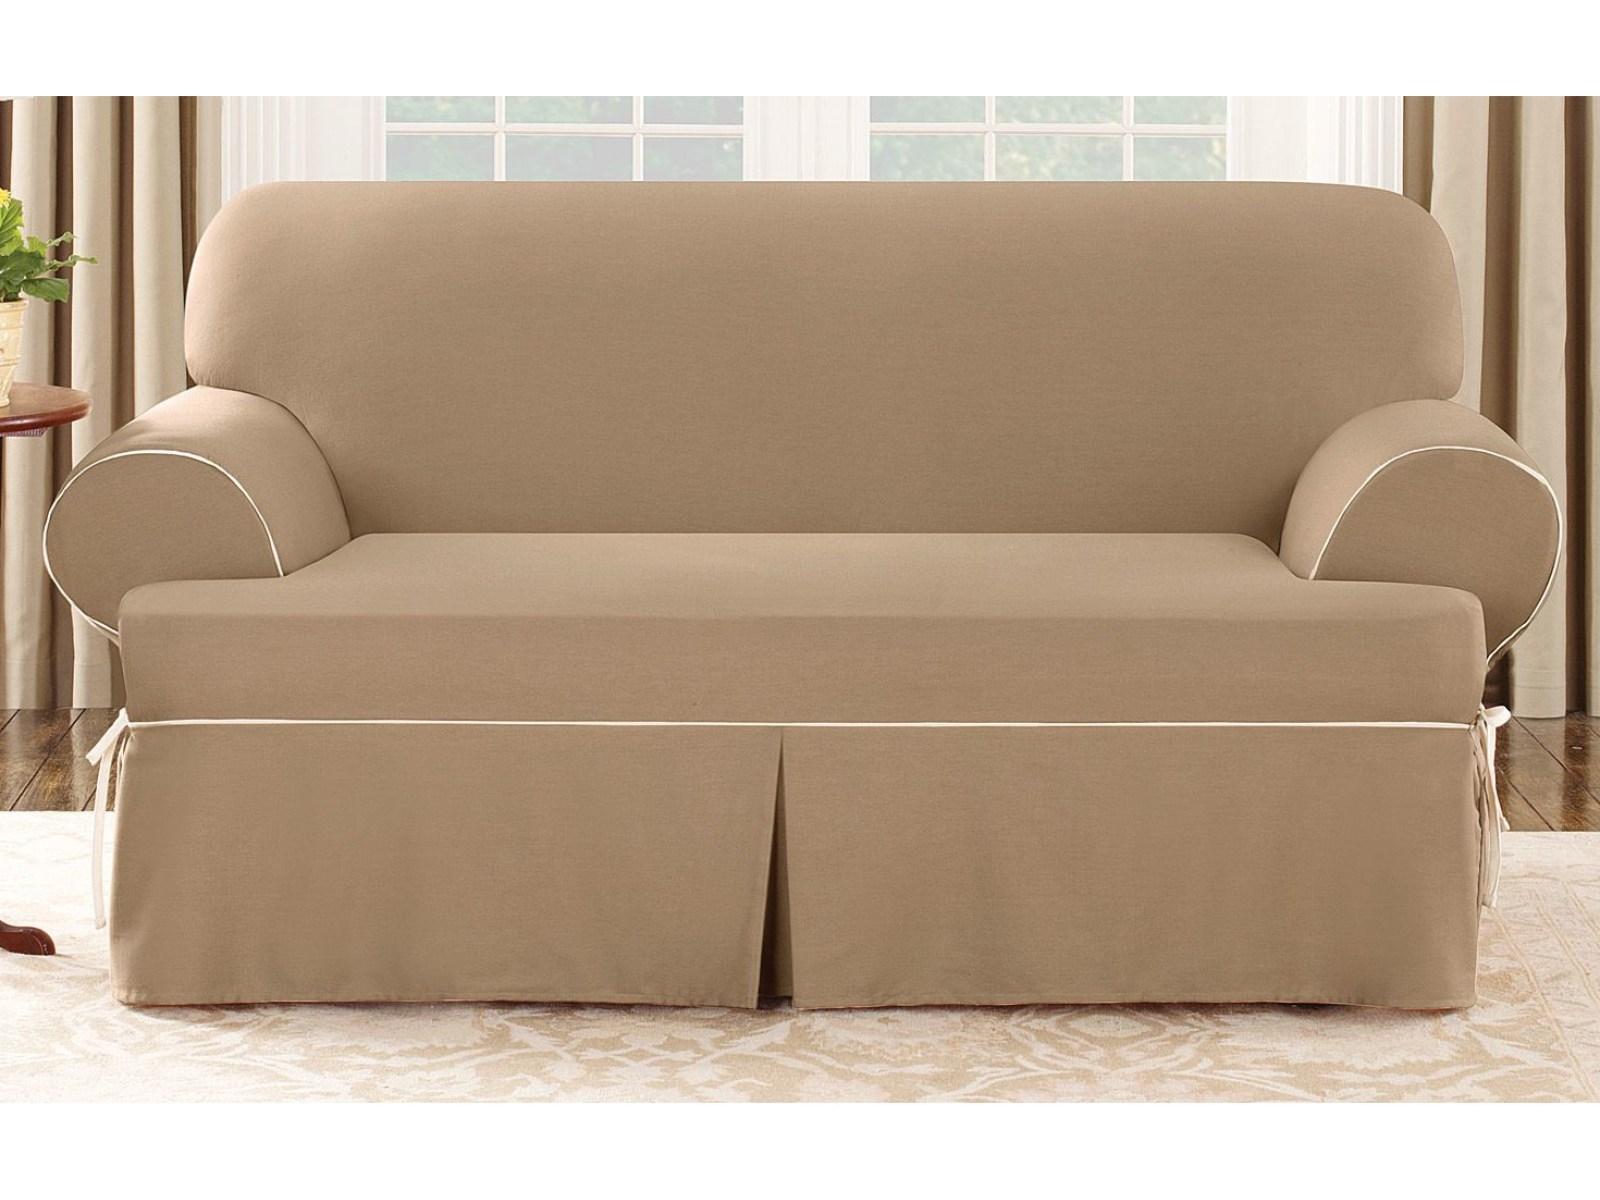 sleeper sofa covers photo - 5